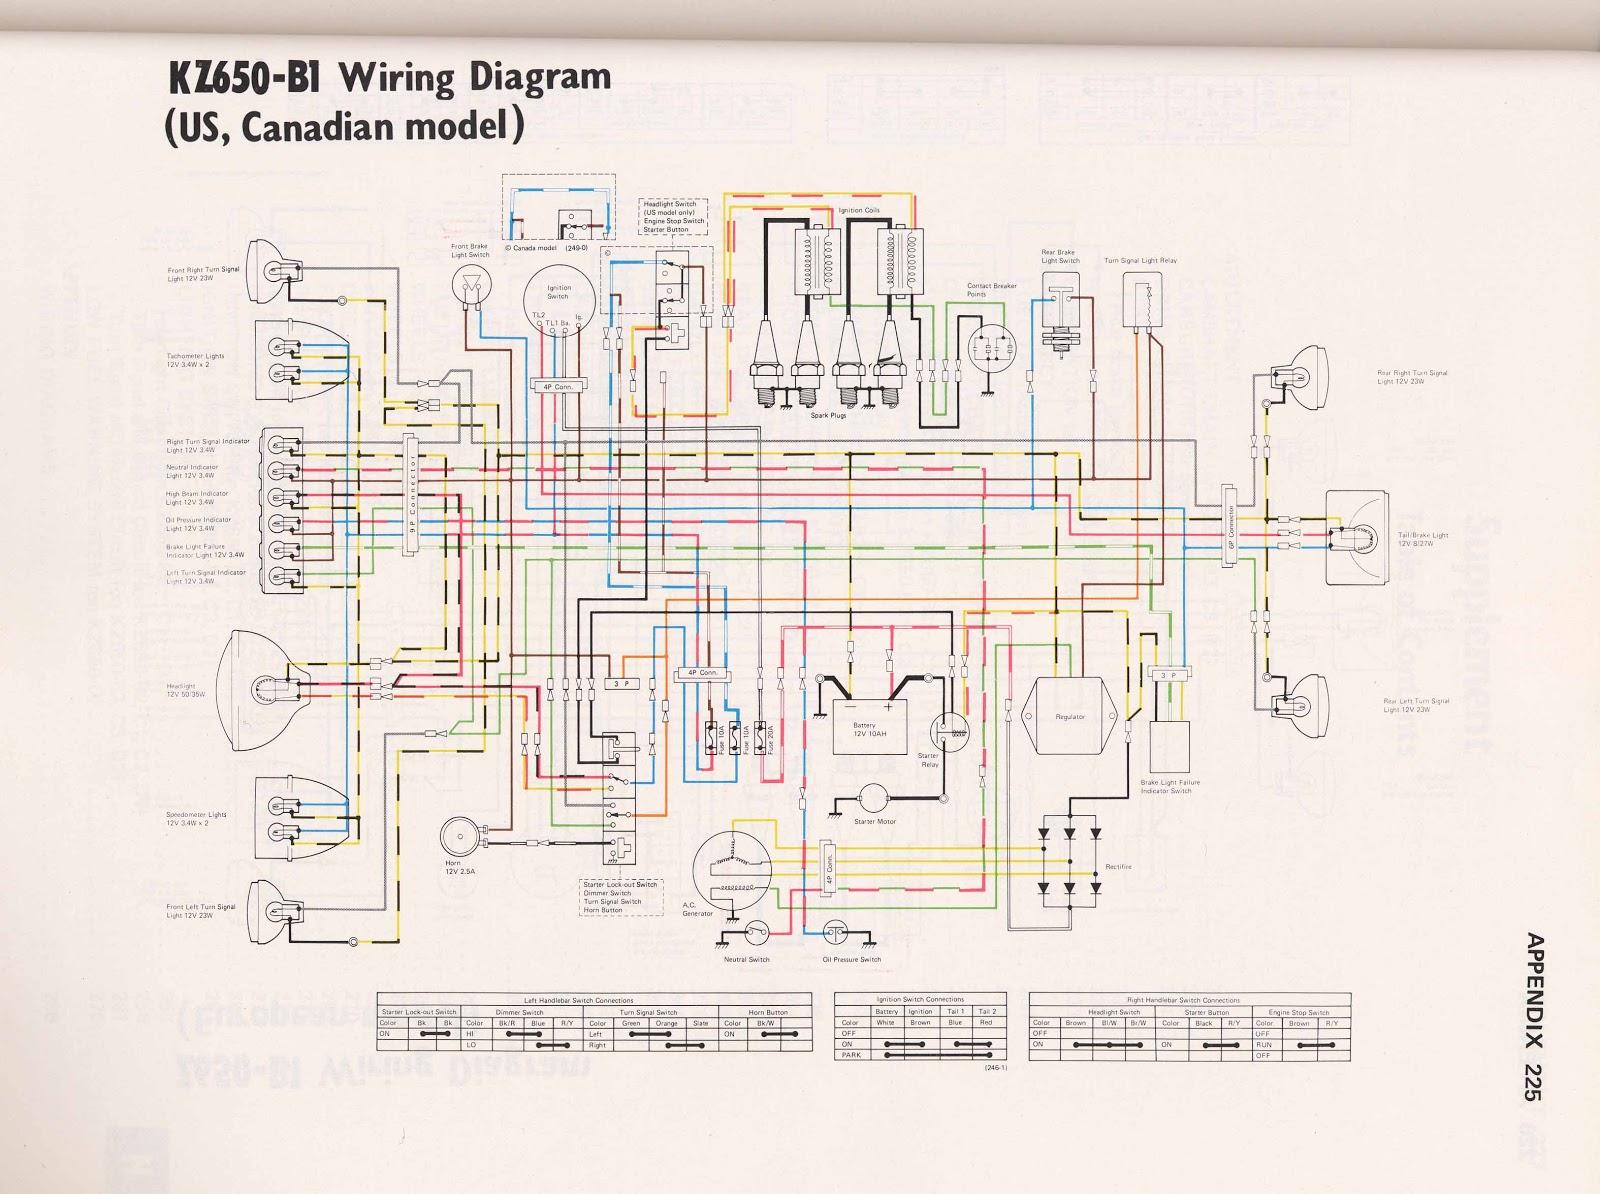 restauro kawasaki z 650: kawasaki z 650 restauro. kawasaki 650r wiring diagram kawasaki hdiii wiring diagram